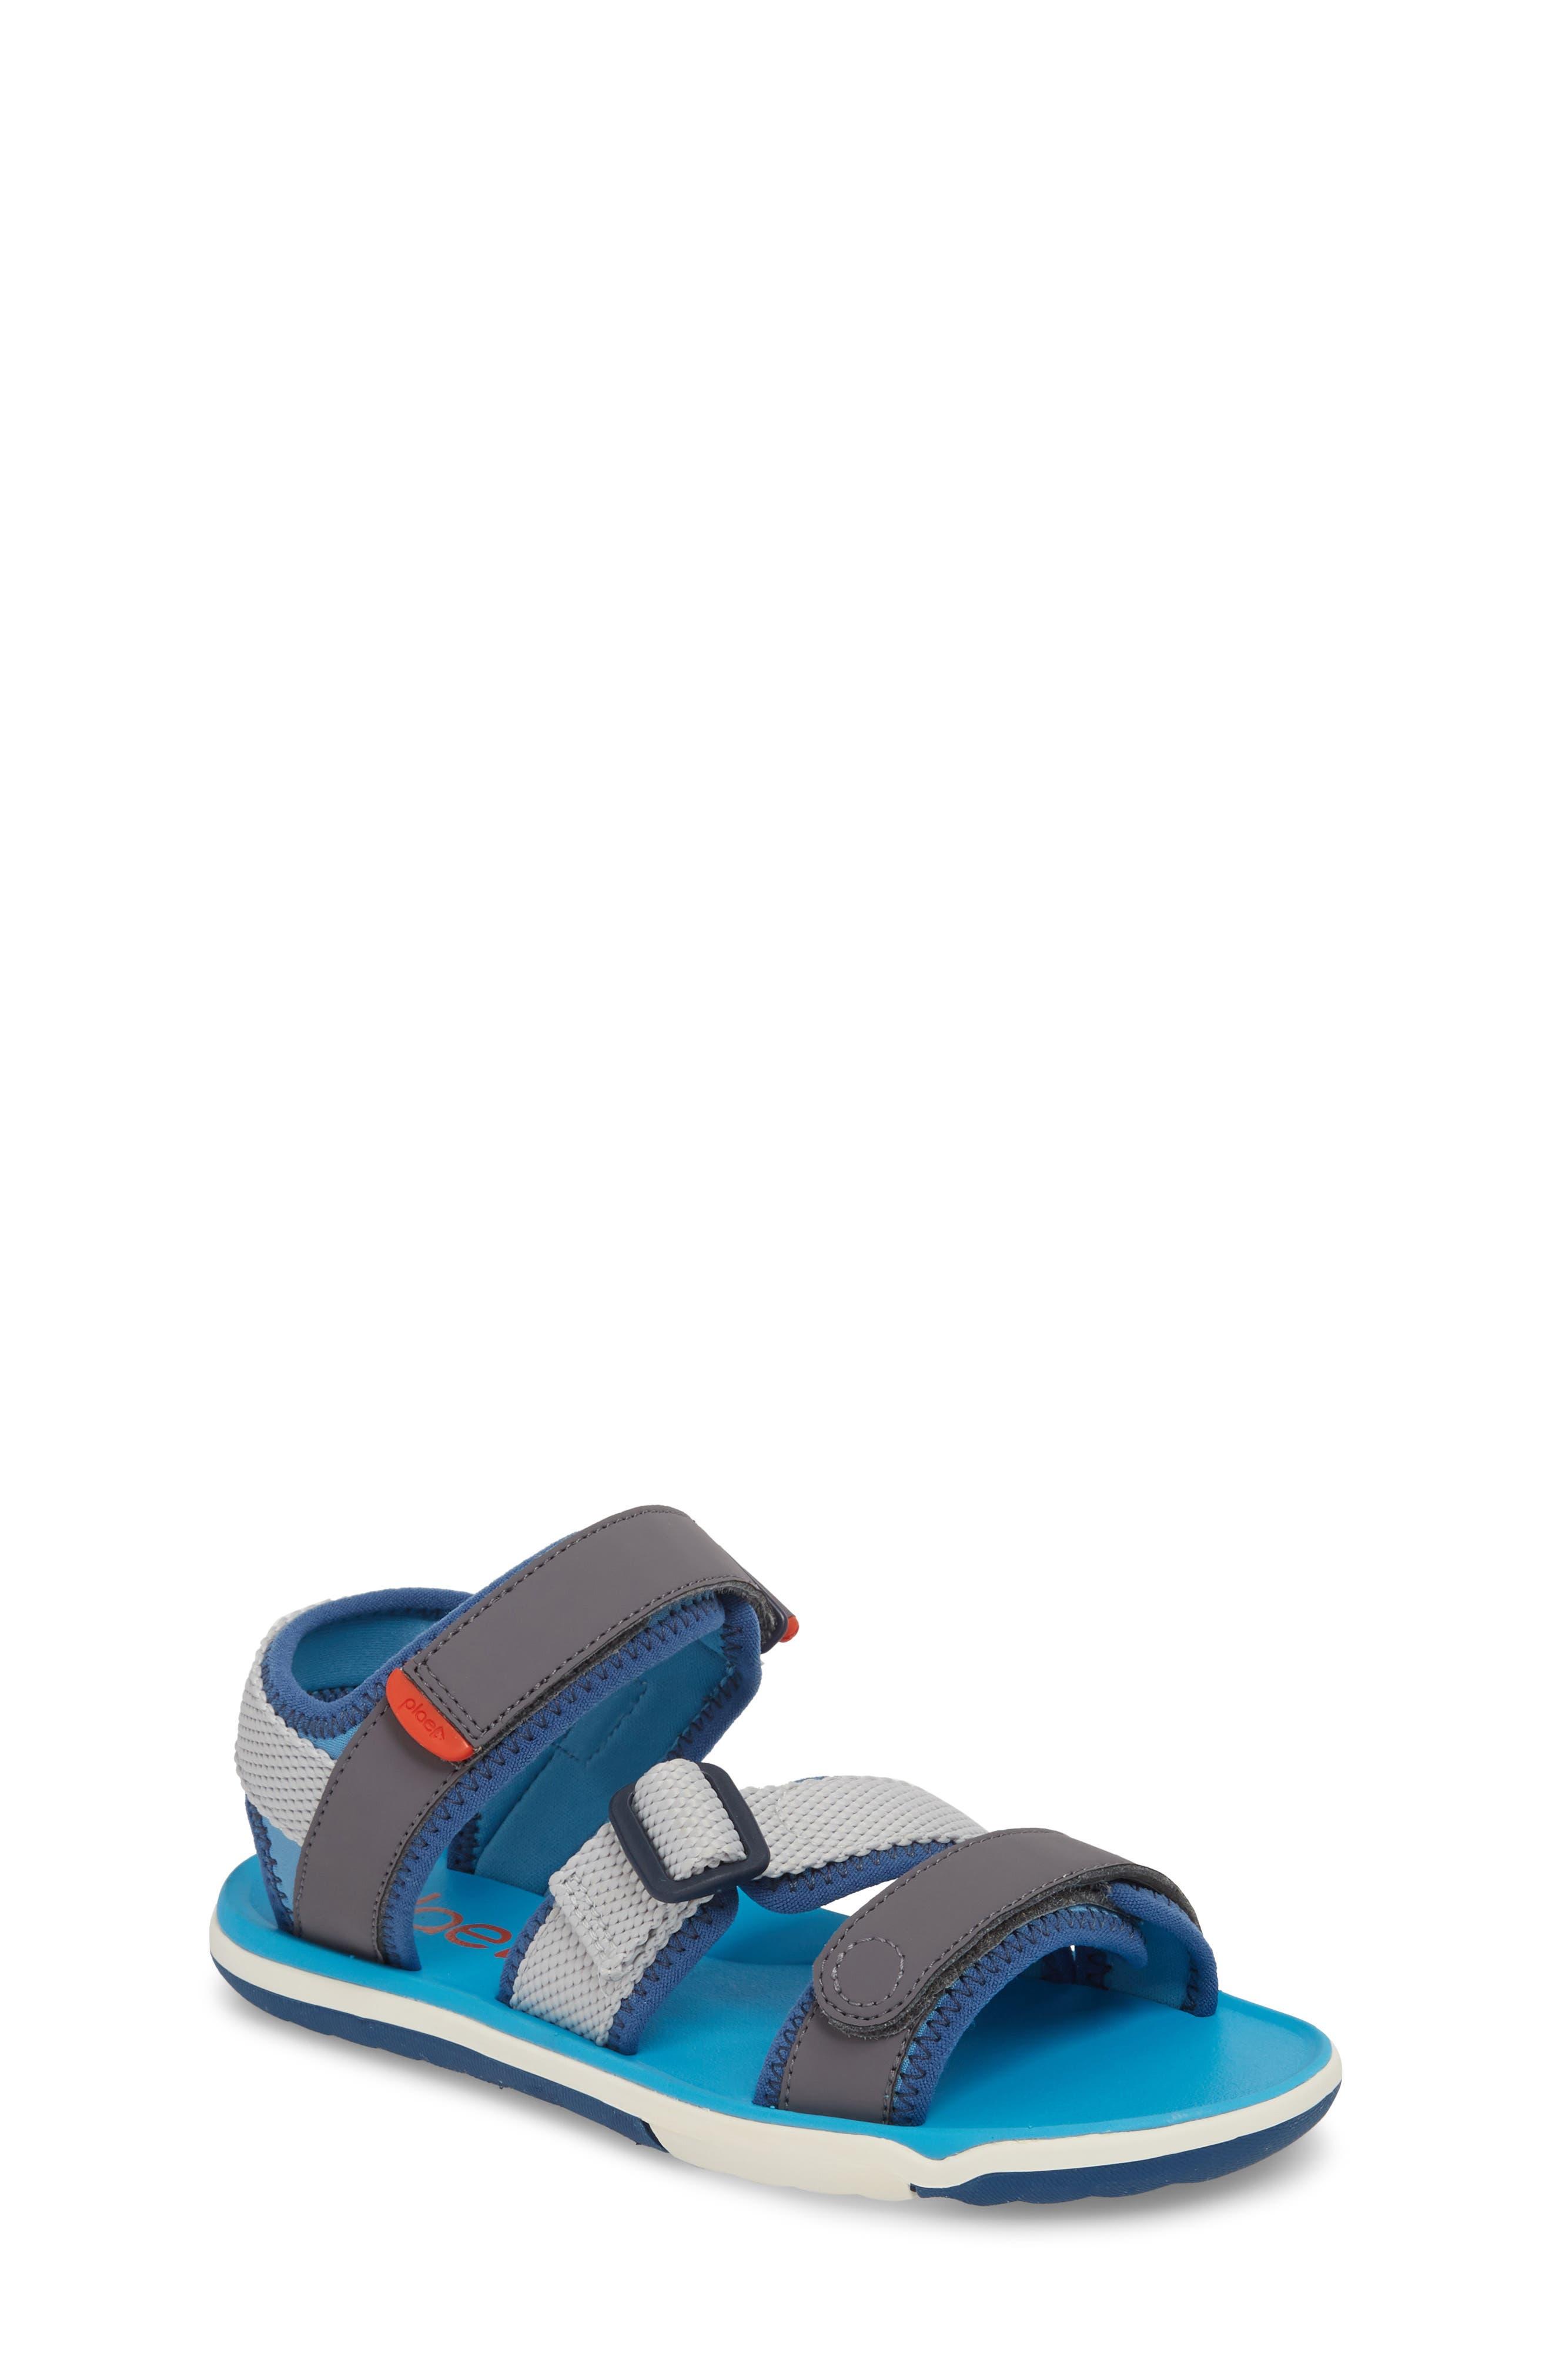 Wes Customizable Sandal,                         Main,                         color, 421